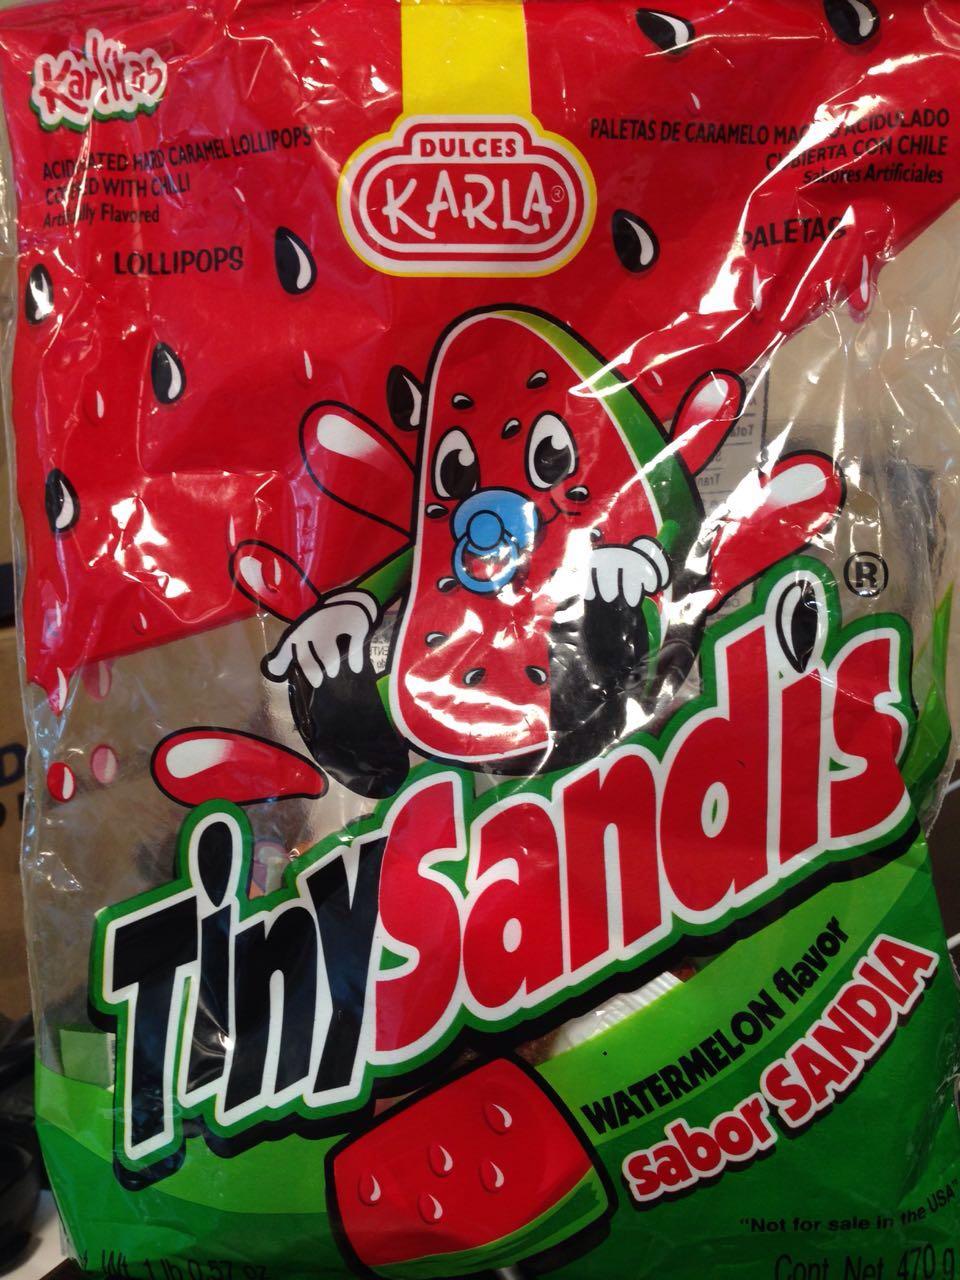 Chedraui: Bolsa de Paletas TinySandis a $3.15